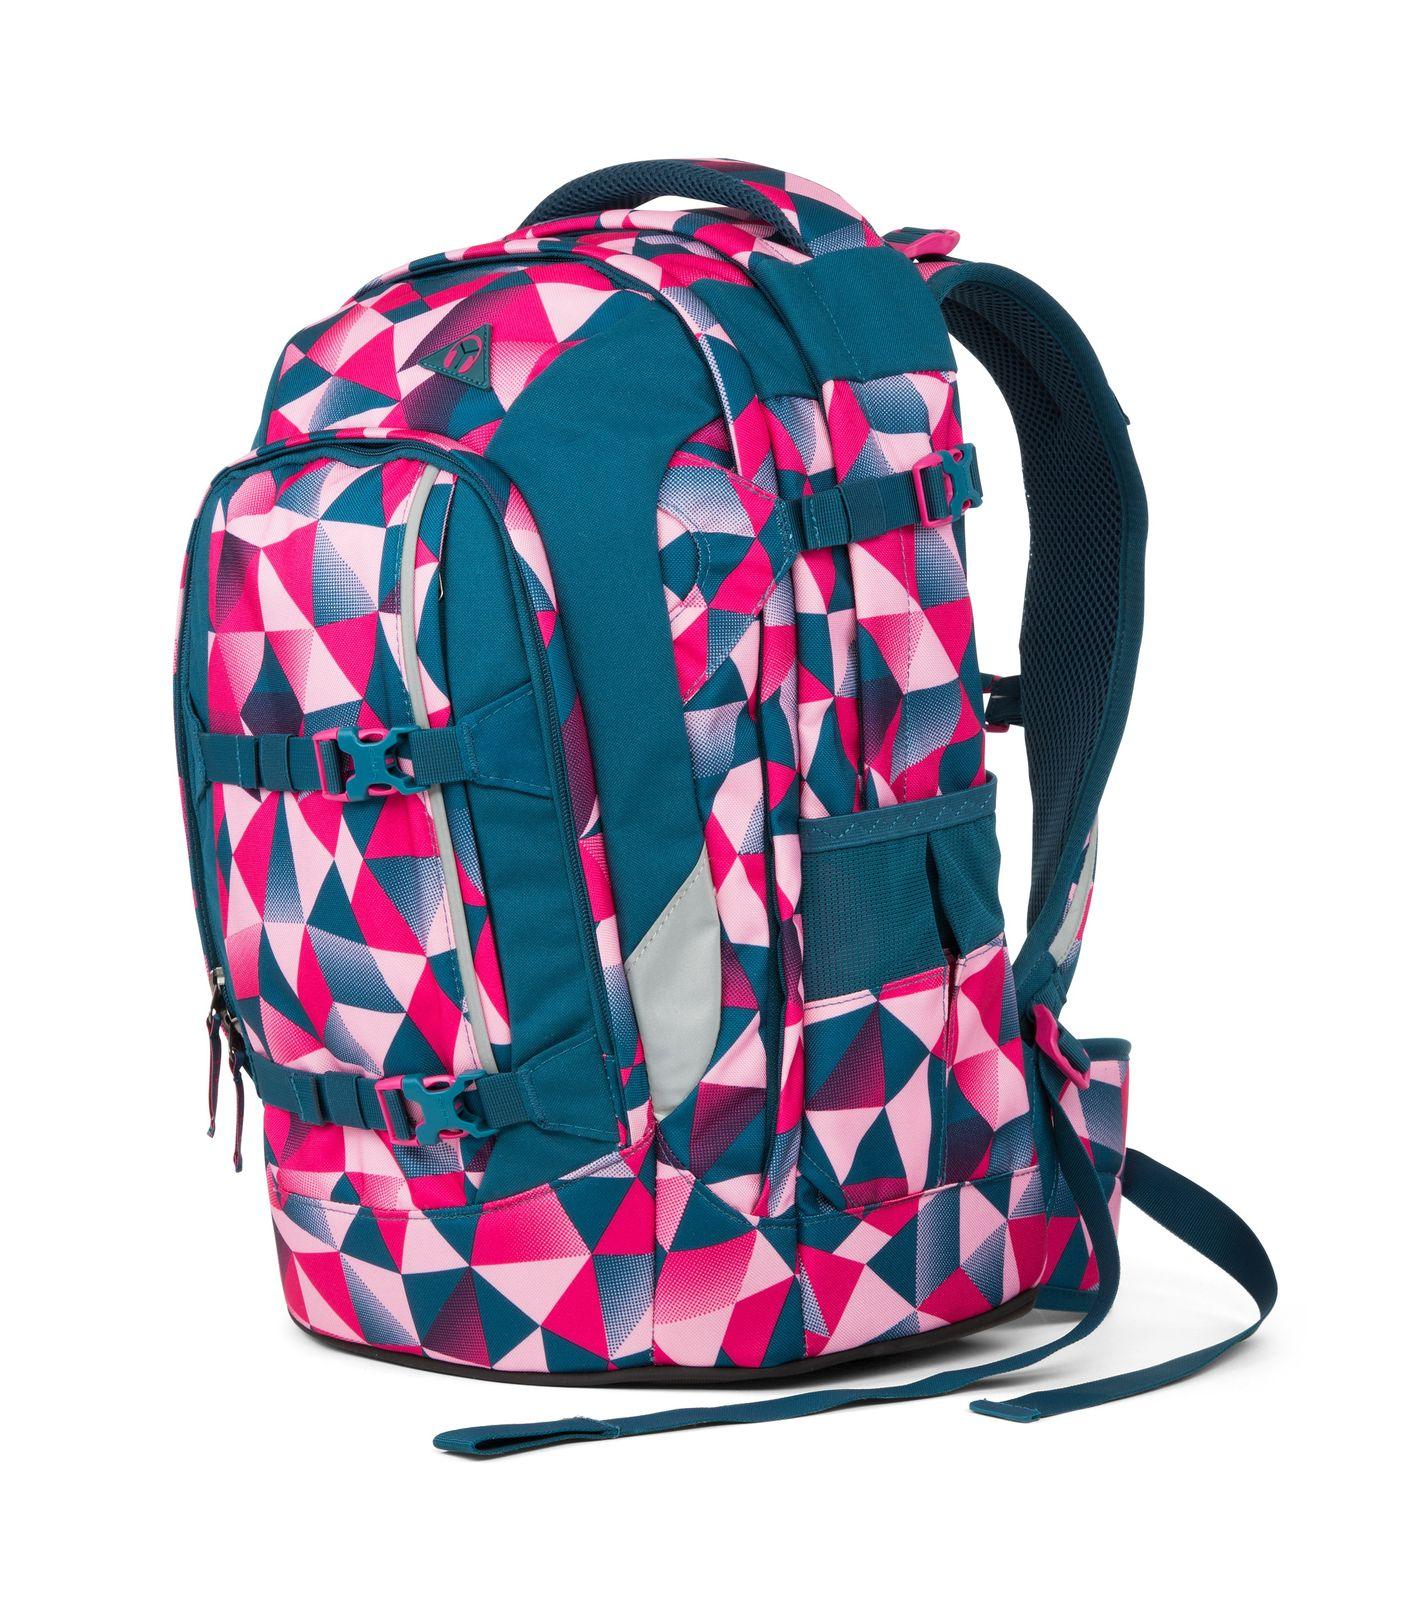 satch pack schulrucksack rucksack schulranzen pink pink. Black Bedroom Furniture Sets. Home Design Ideas